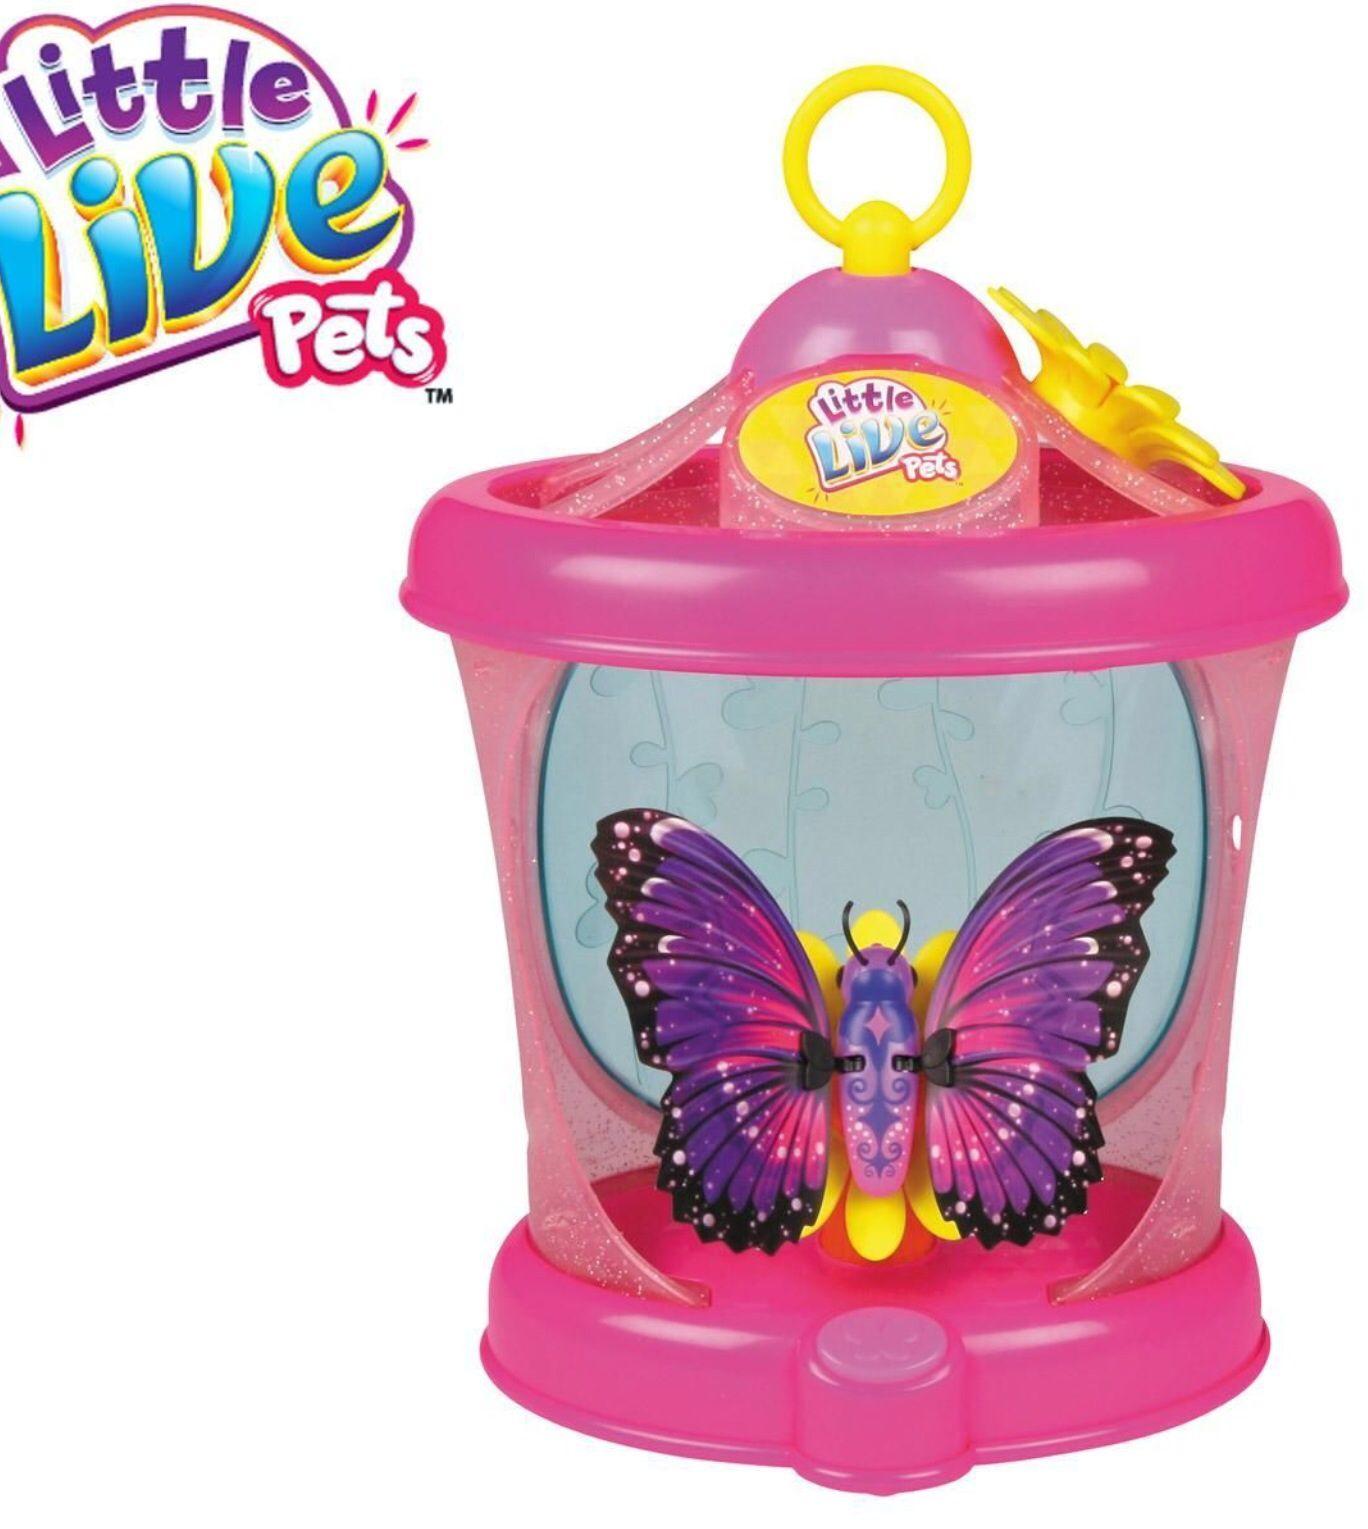 Toys Pets Butterflies Butterfly Kids Gift Present Little Live Pets Jojo Bows Love Pet